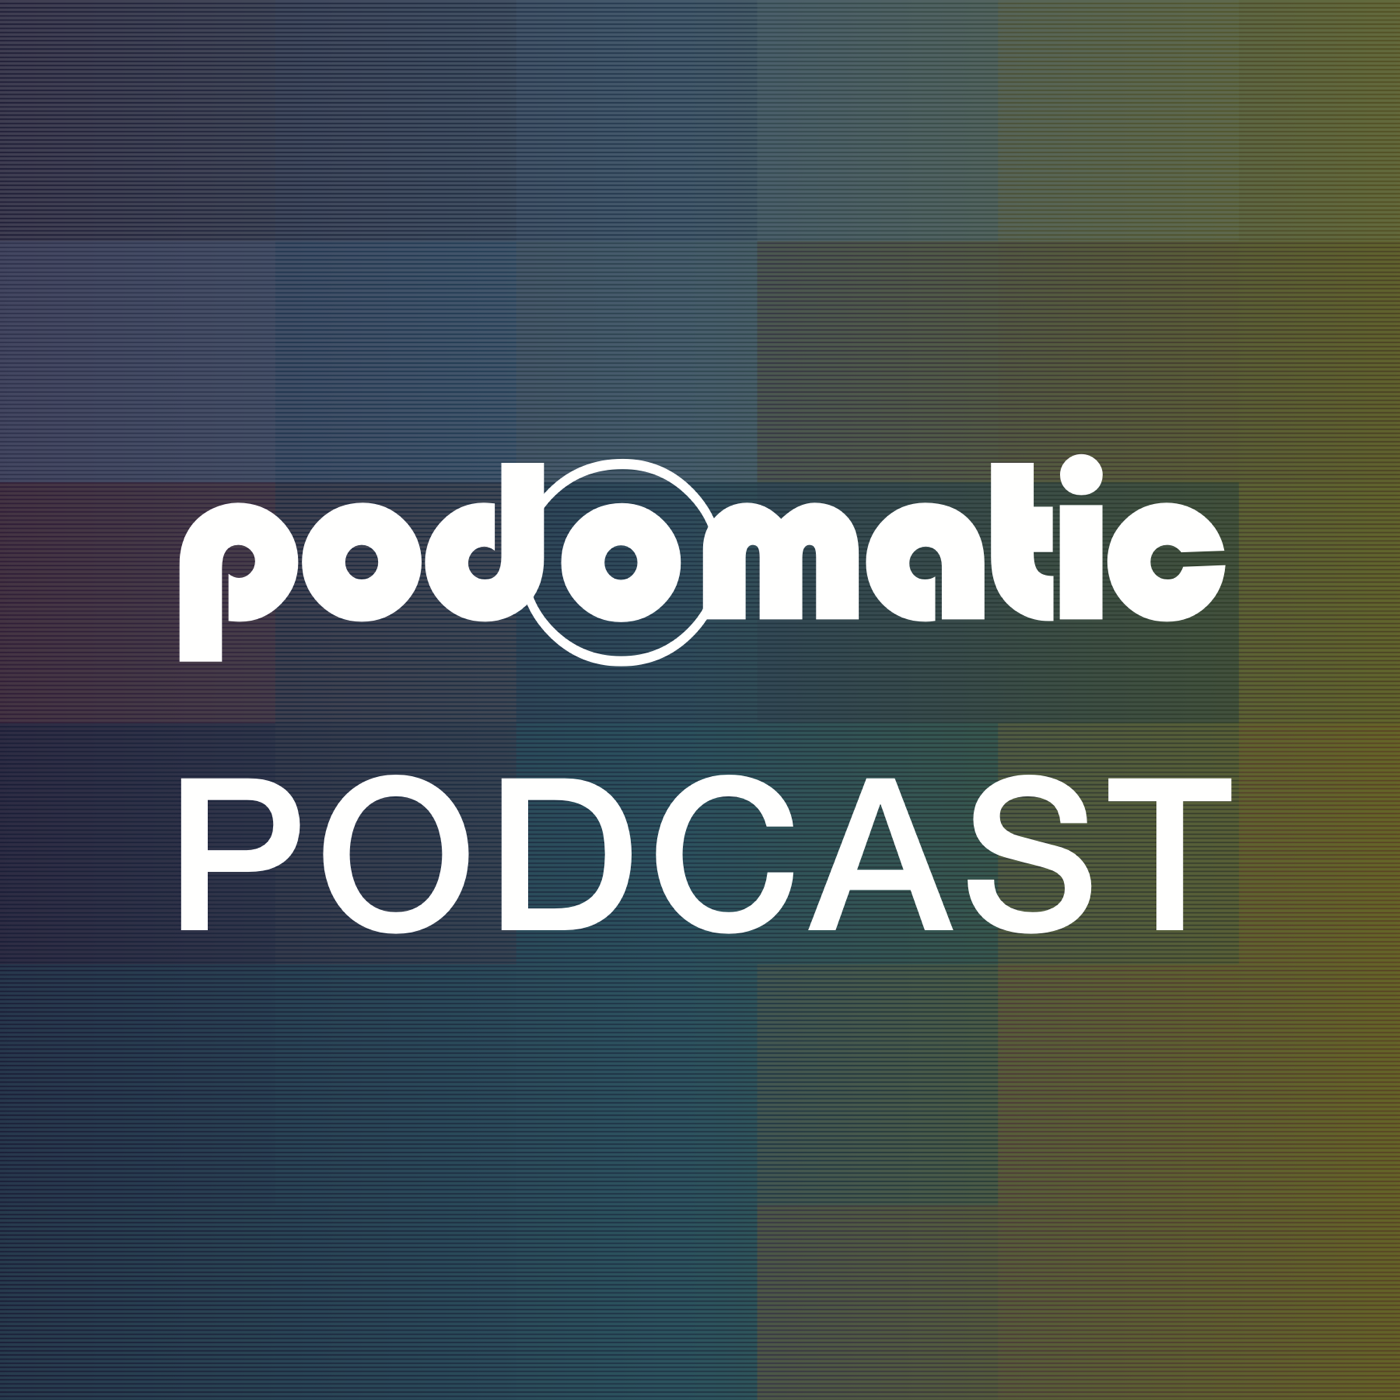 ablq89@gmail.com's Podcast